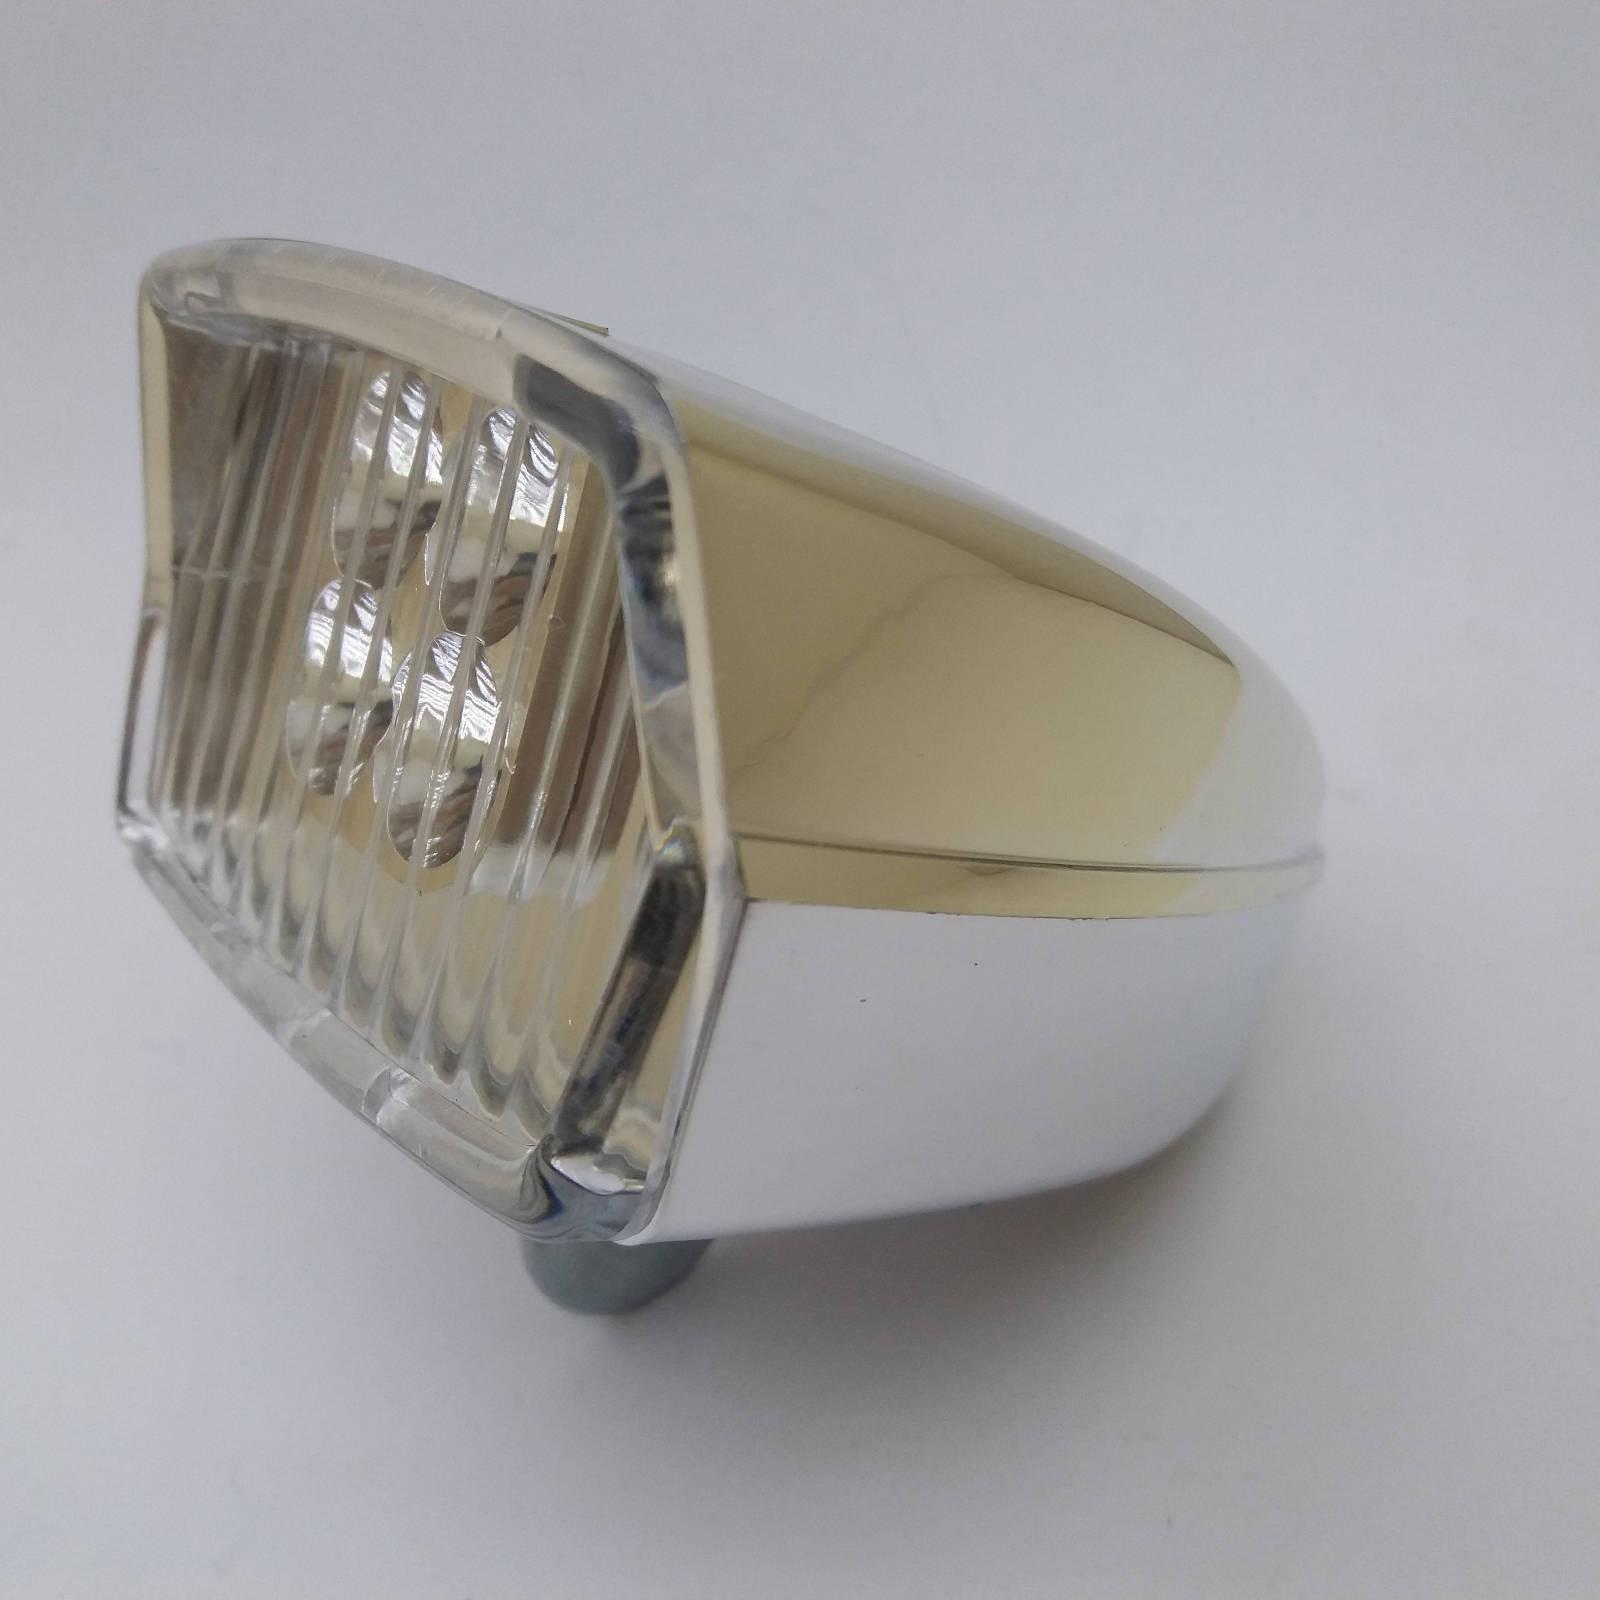 Vintage Square Bicycle Light dynamo